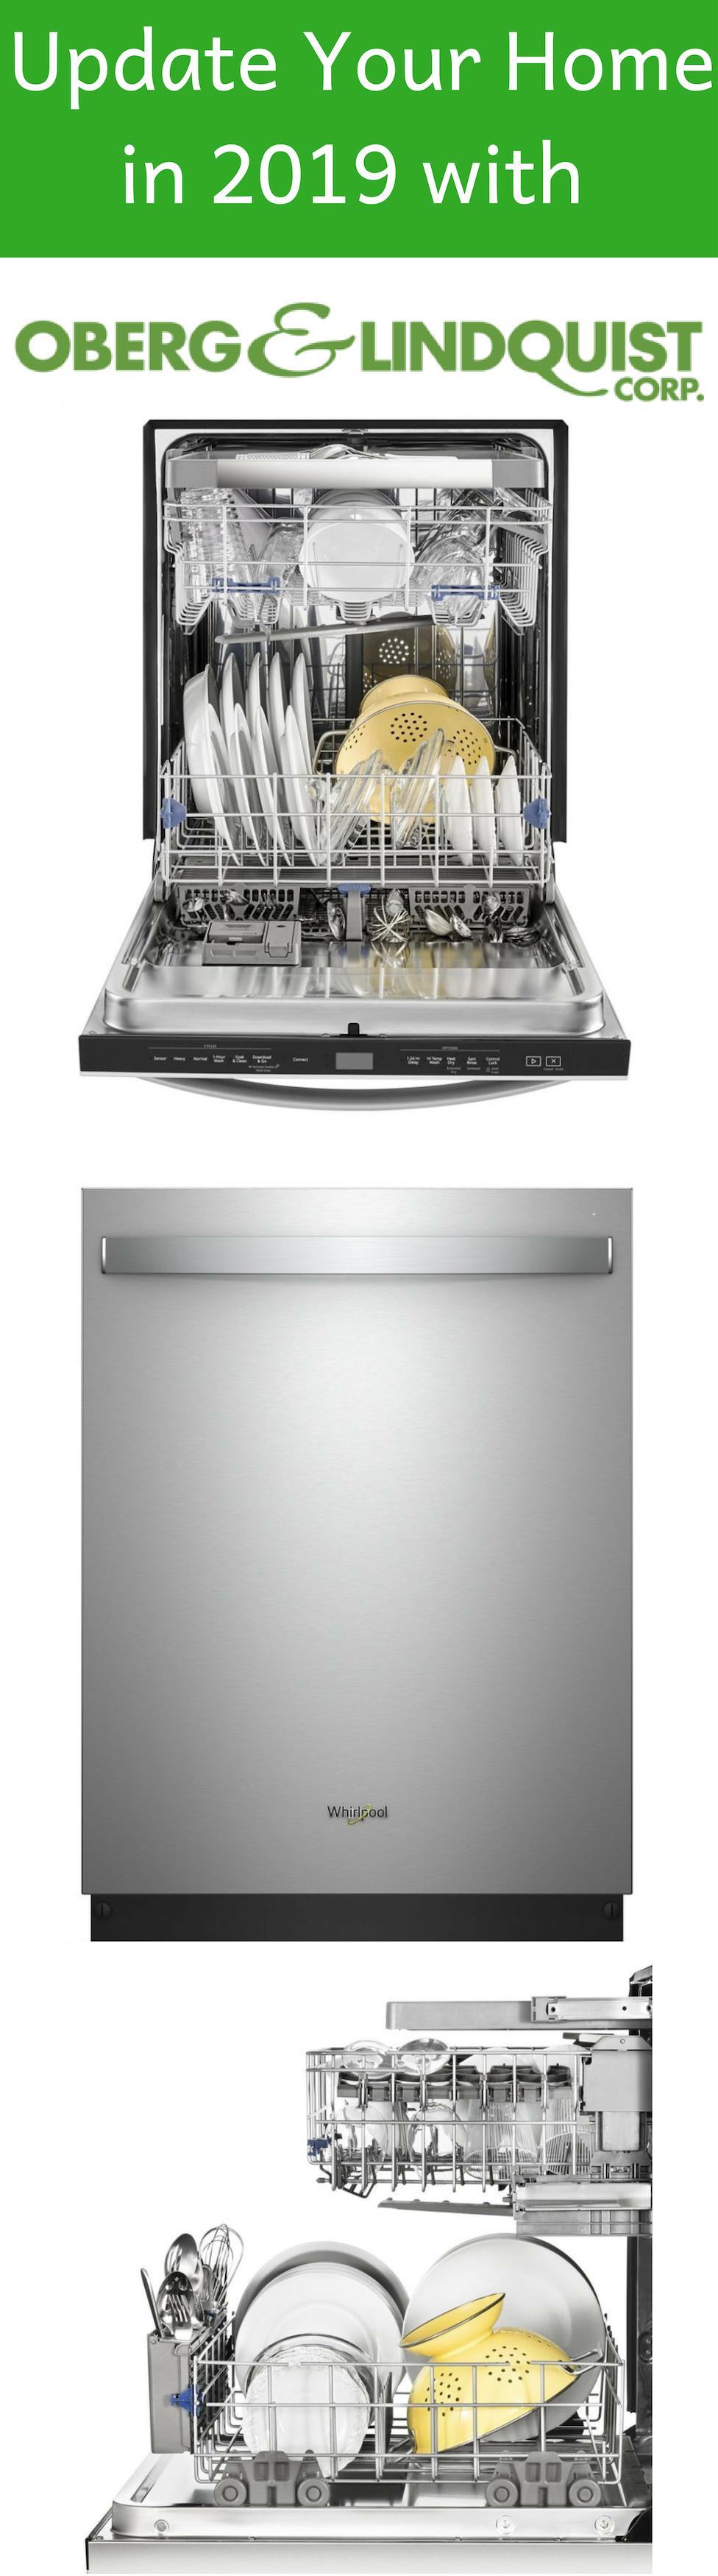 Appliances On Sale In Celebration Of Presidents Day Presidentsdaysale Appliances B Retro Kitchen Appliances Kitchenaid Refrigerator Energy Star Appliances